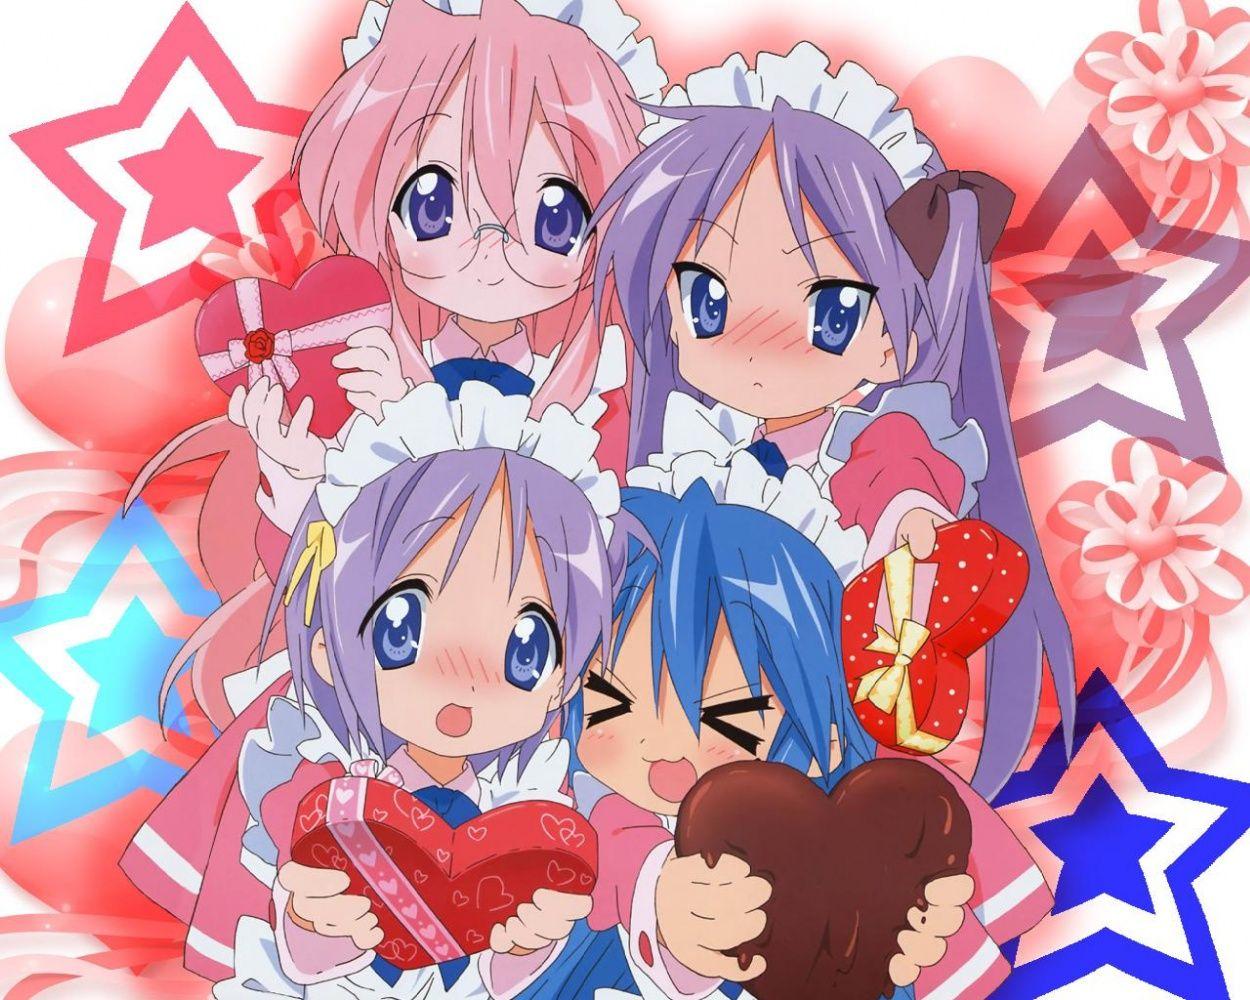 Schön Anime Valentineu0027s Day | Valentineu0027s Day (anime/manga ...